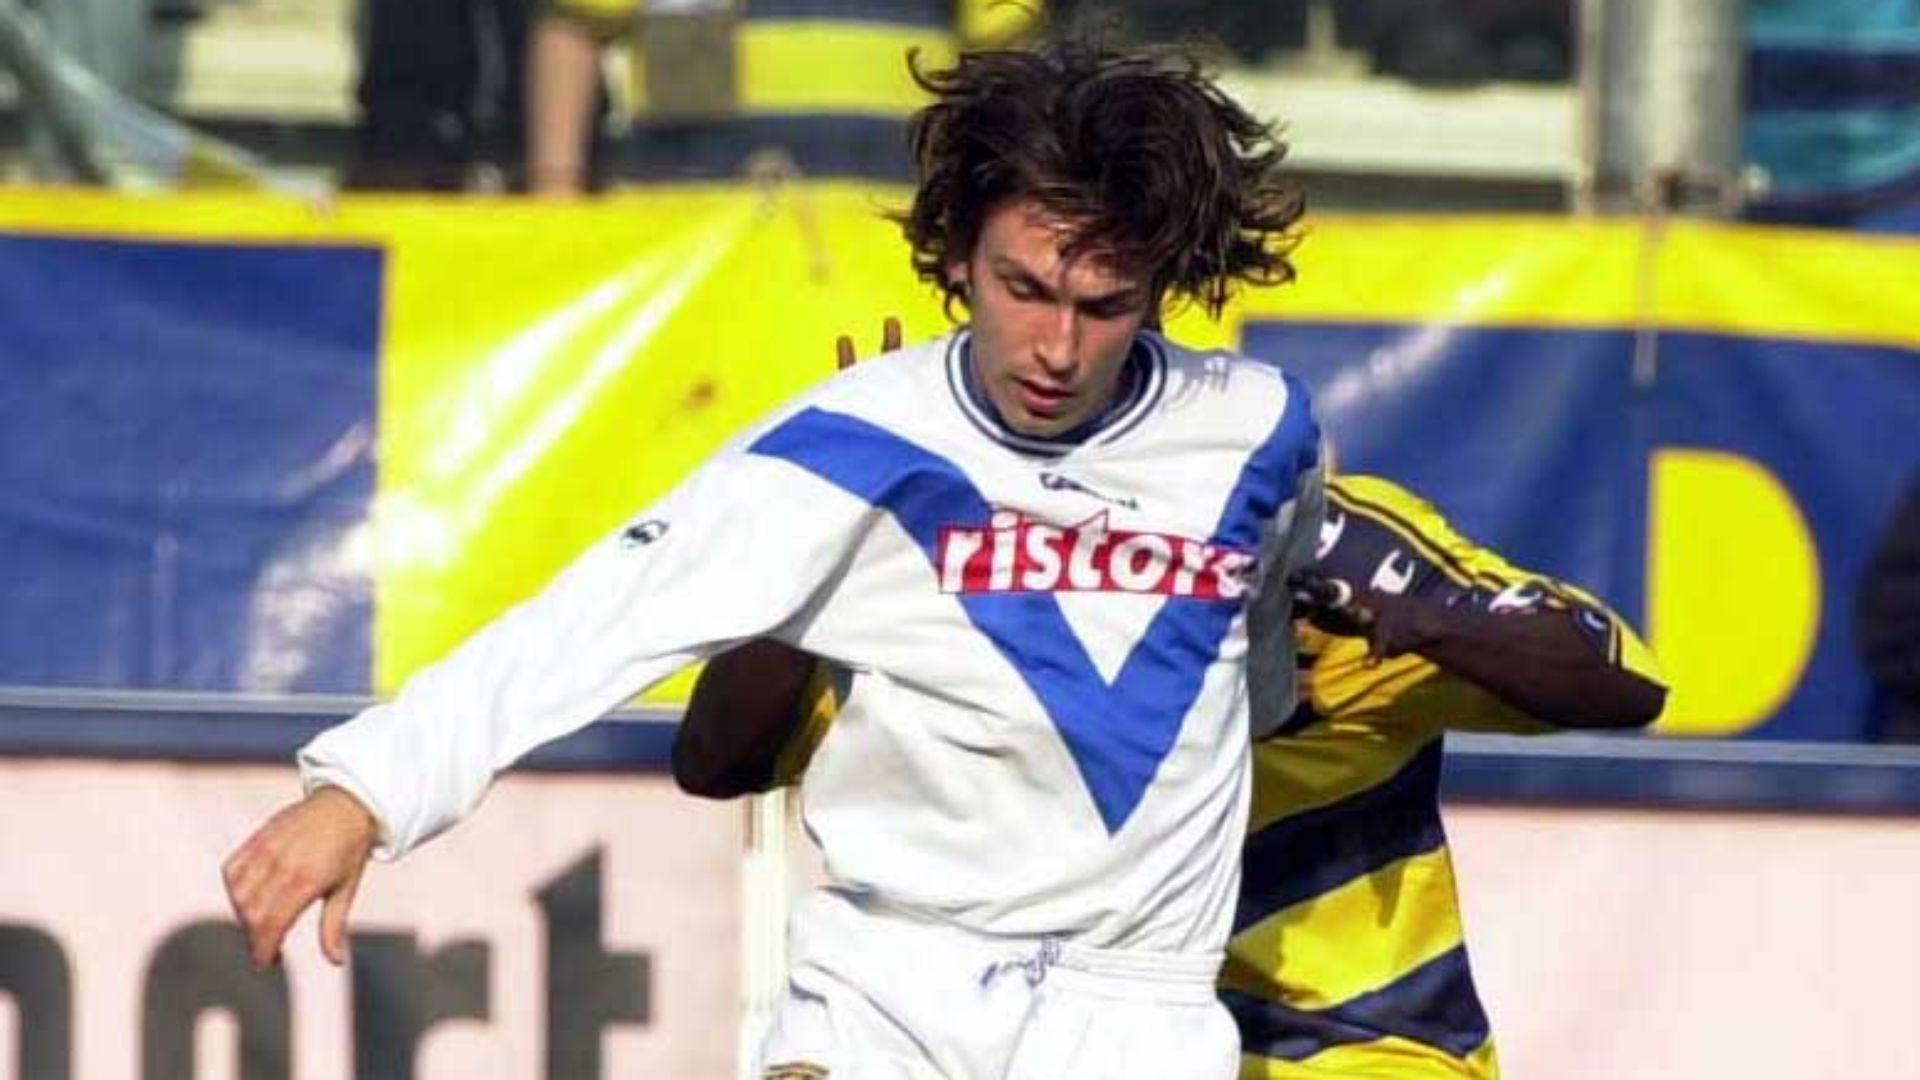 Farewell retiring Andrea Pirlo football s last artist in an era